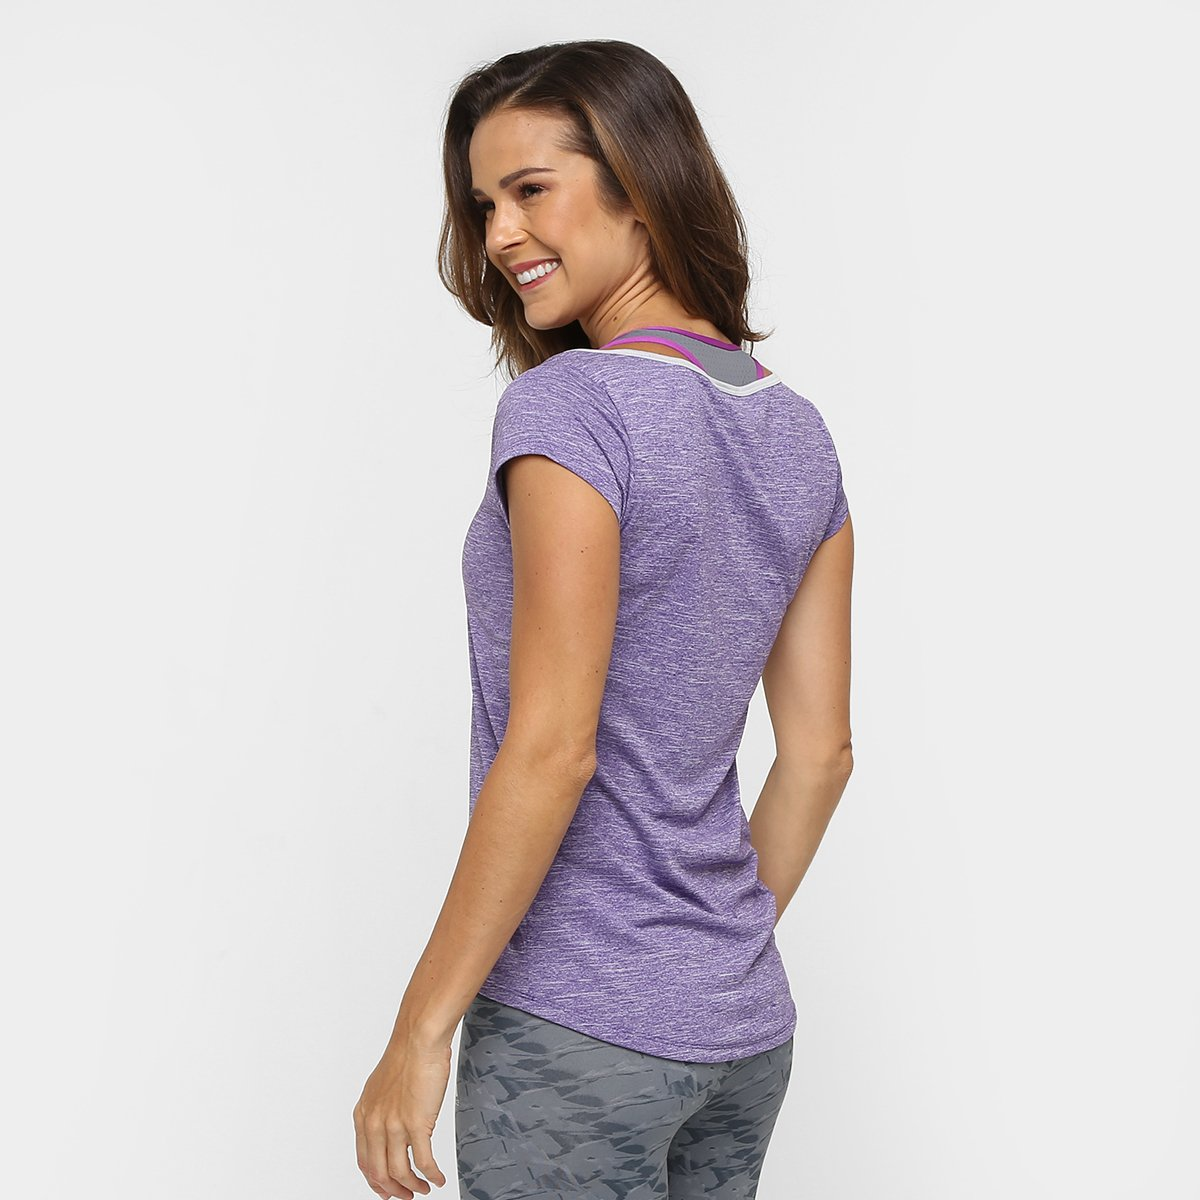 Clima Camiseta Ess Adidas Adidas Roxo Feminina Camiseta Ess Mescla vgzgF4q